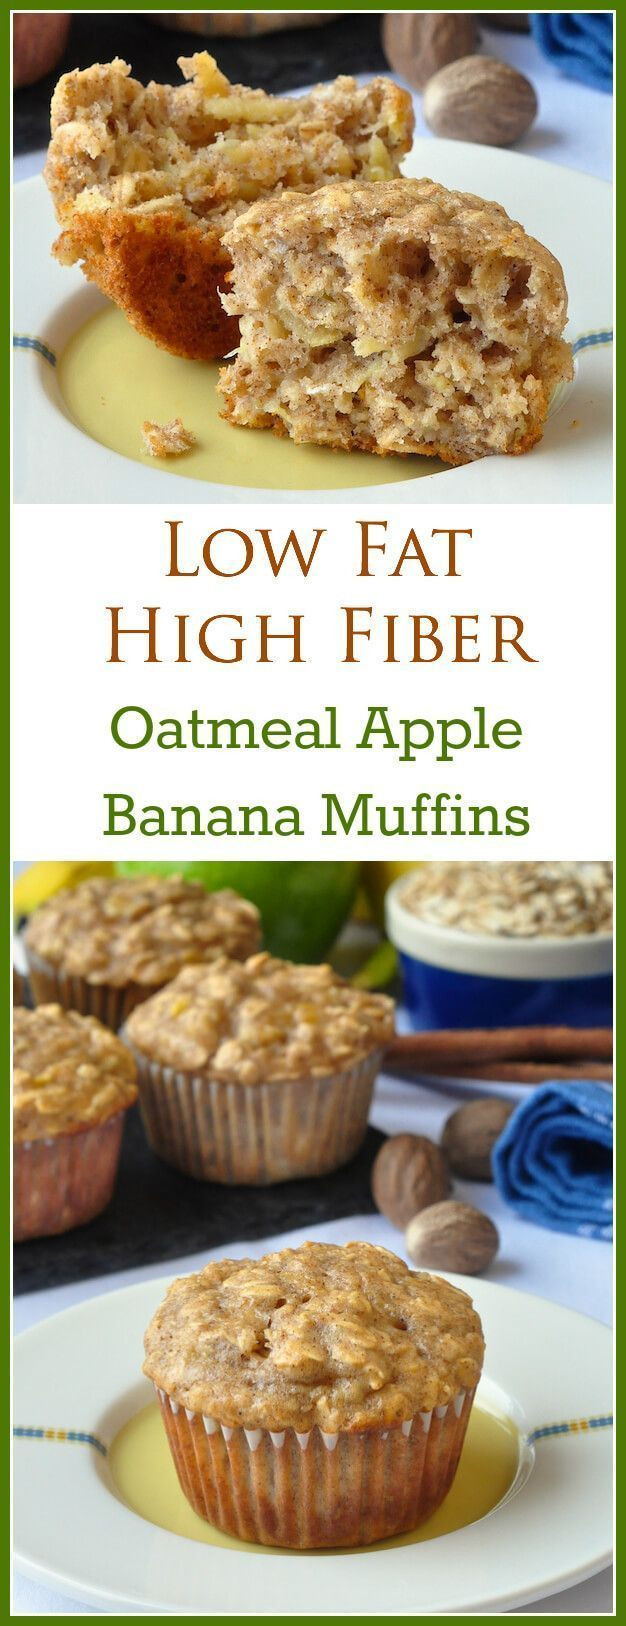 Healthy Breakfast Muffins Recipe  Oatmeal Apple Banana Low Fat Muffins Recipe